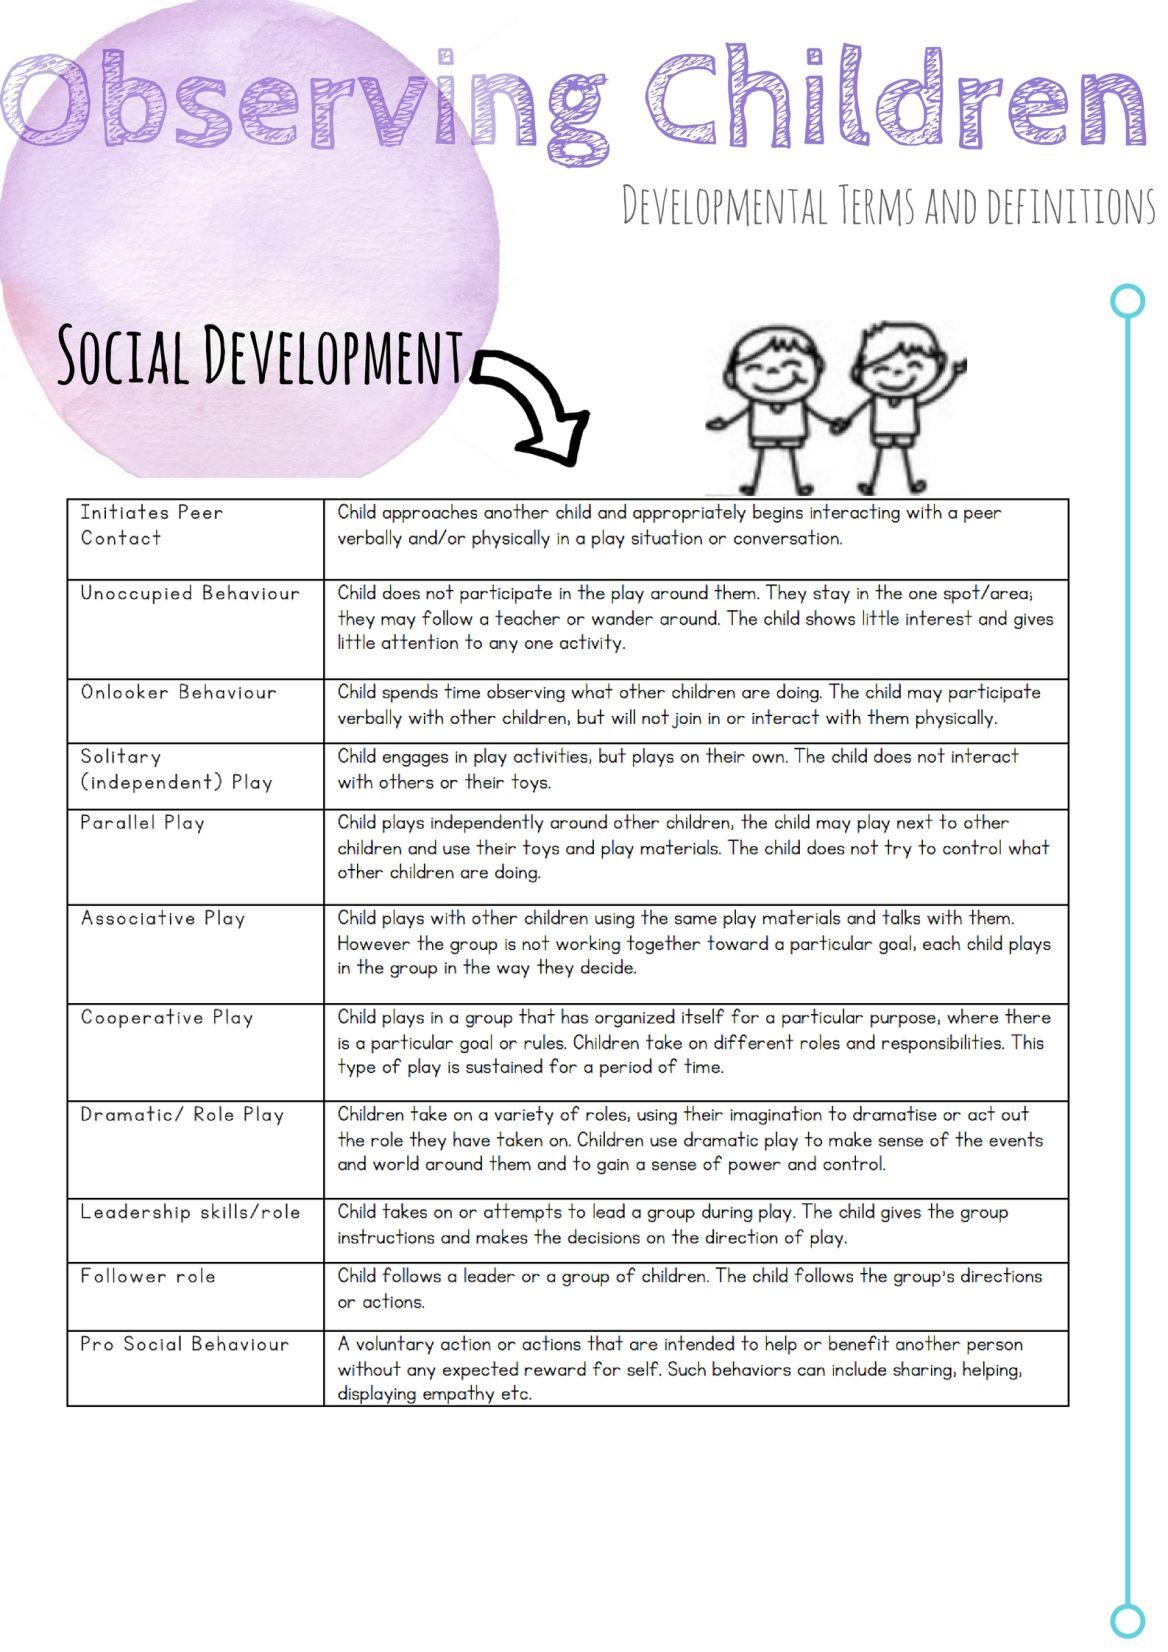 Child Development Preschool Development Learning Social